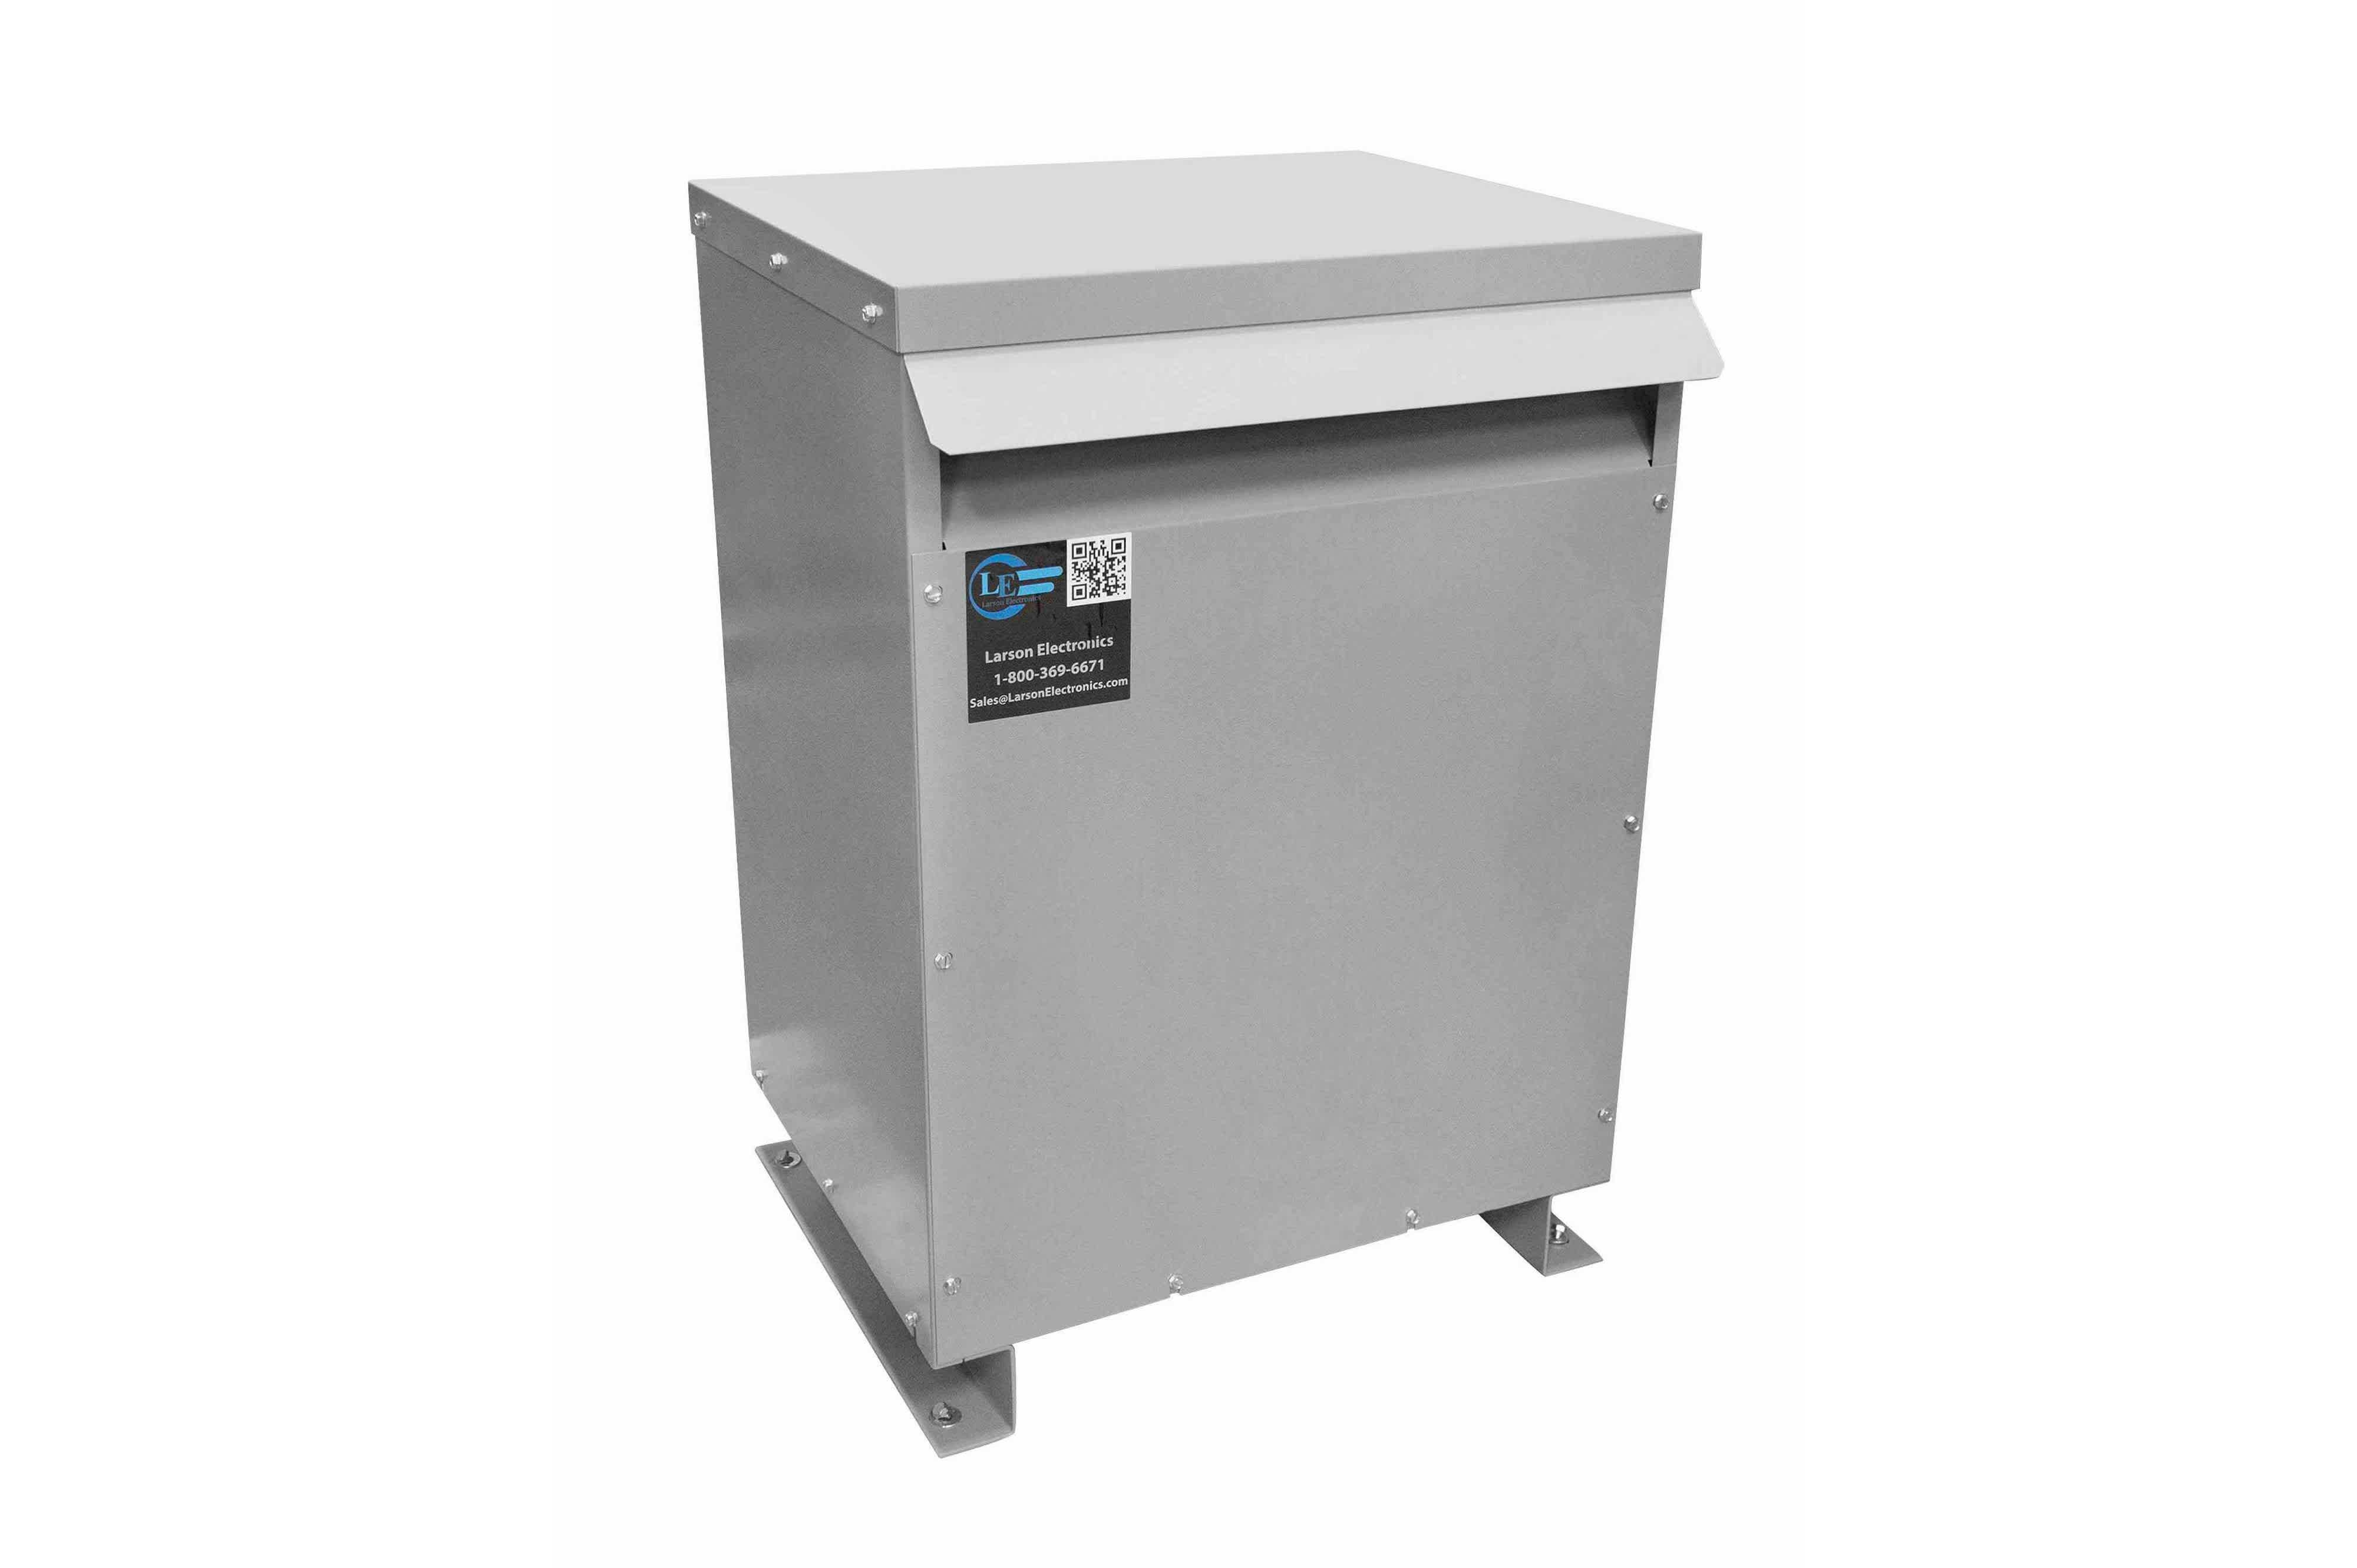 400 kVA 3PH Isolation Transformer, 460V Wye Primary, 400V Delta Secondary, N3R, Ventilated, 60 Hz